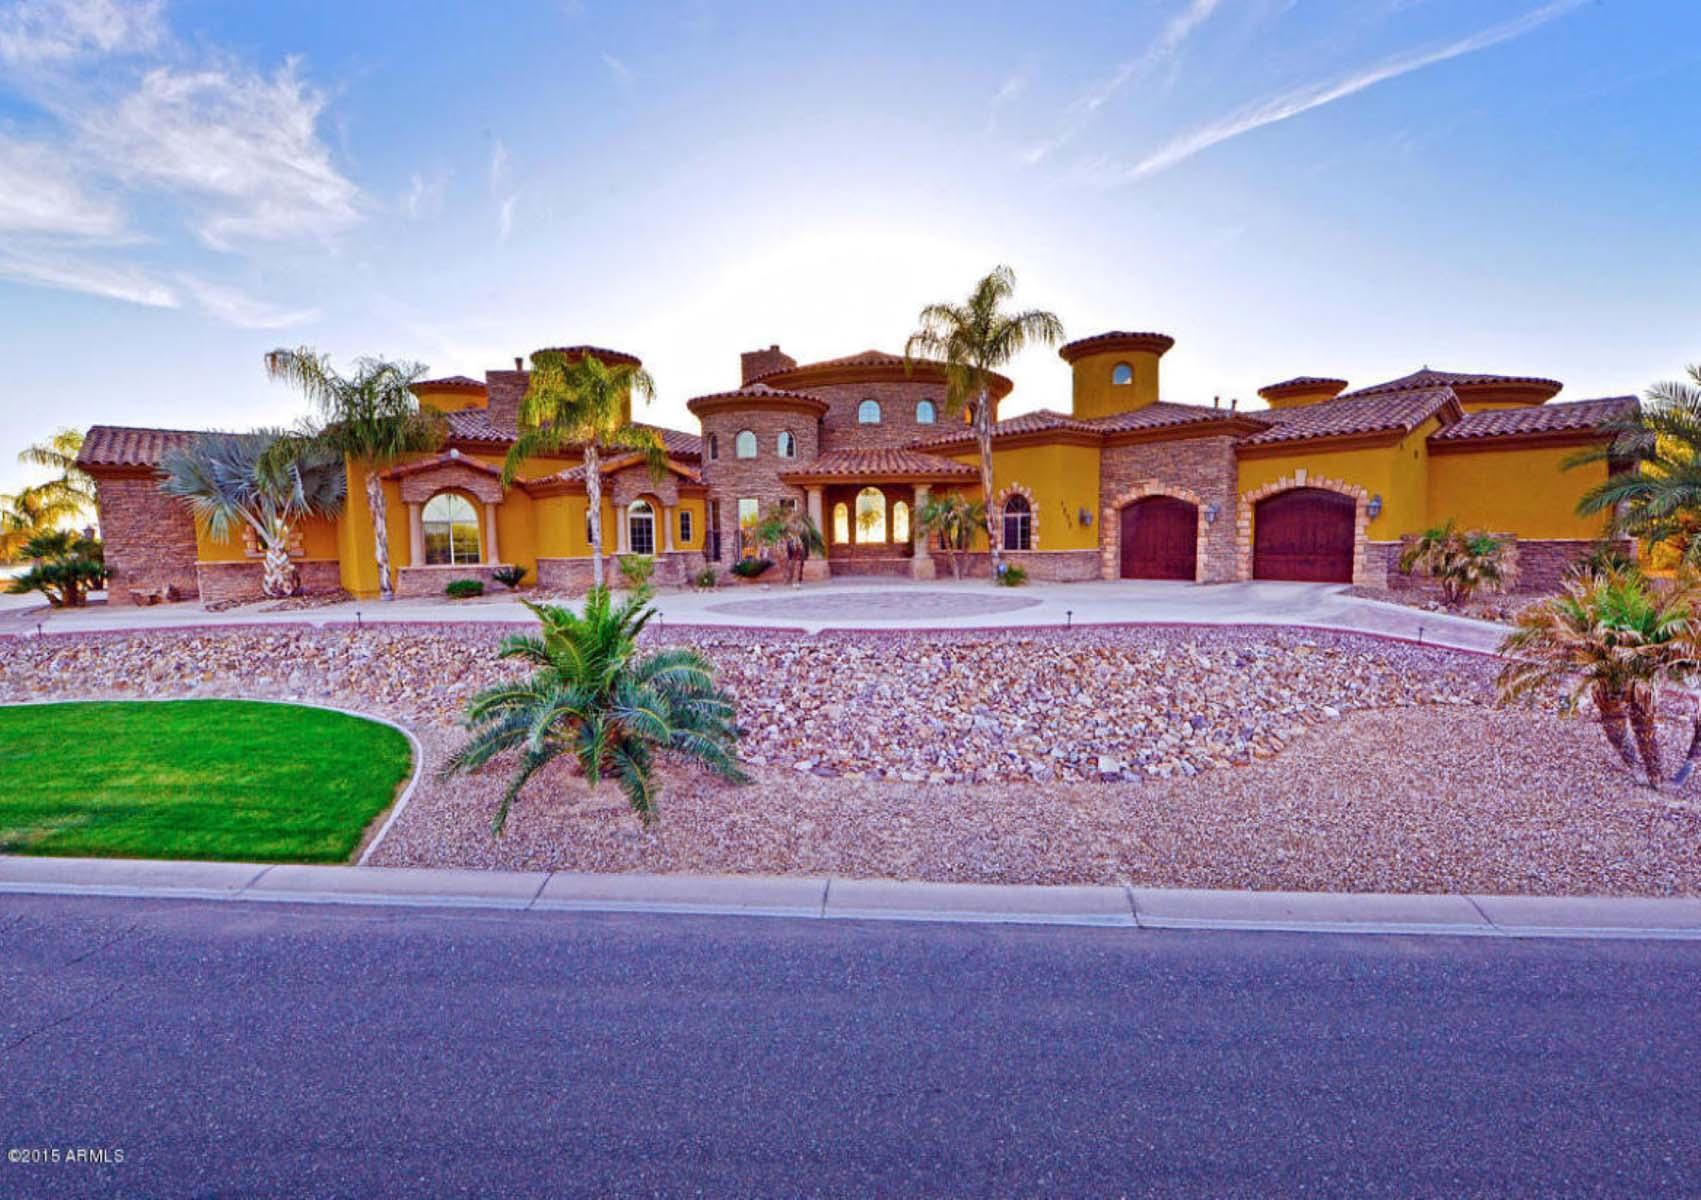 独户住宅 为 销售 在 Lakefront property in Santan Lakeside Estates. 7270 S BEACH BLVD Queen Creek, 亚利桑那州 85142 美国